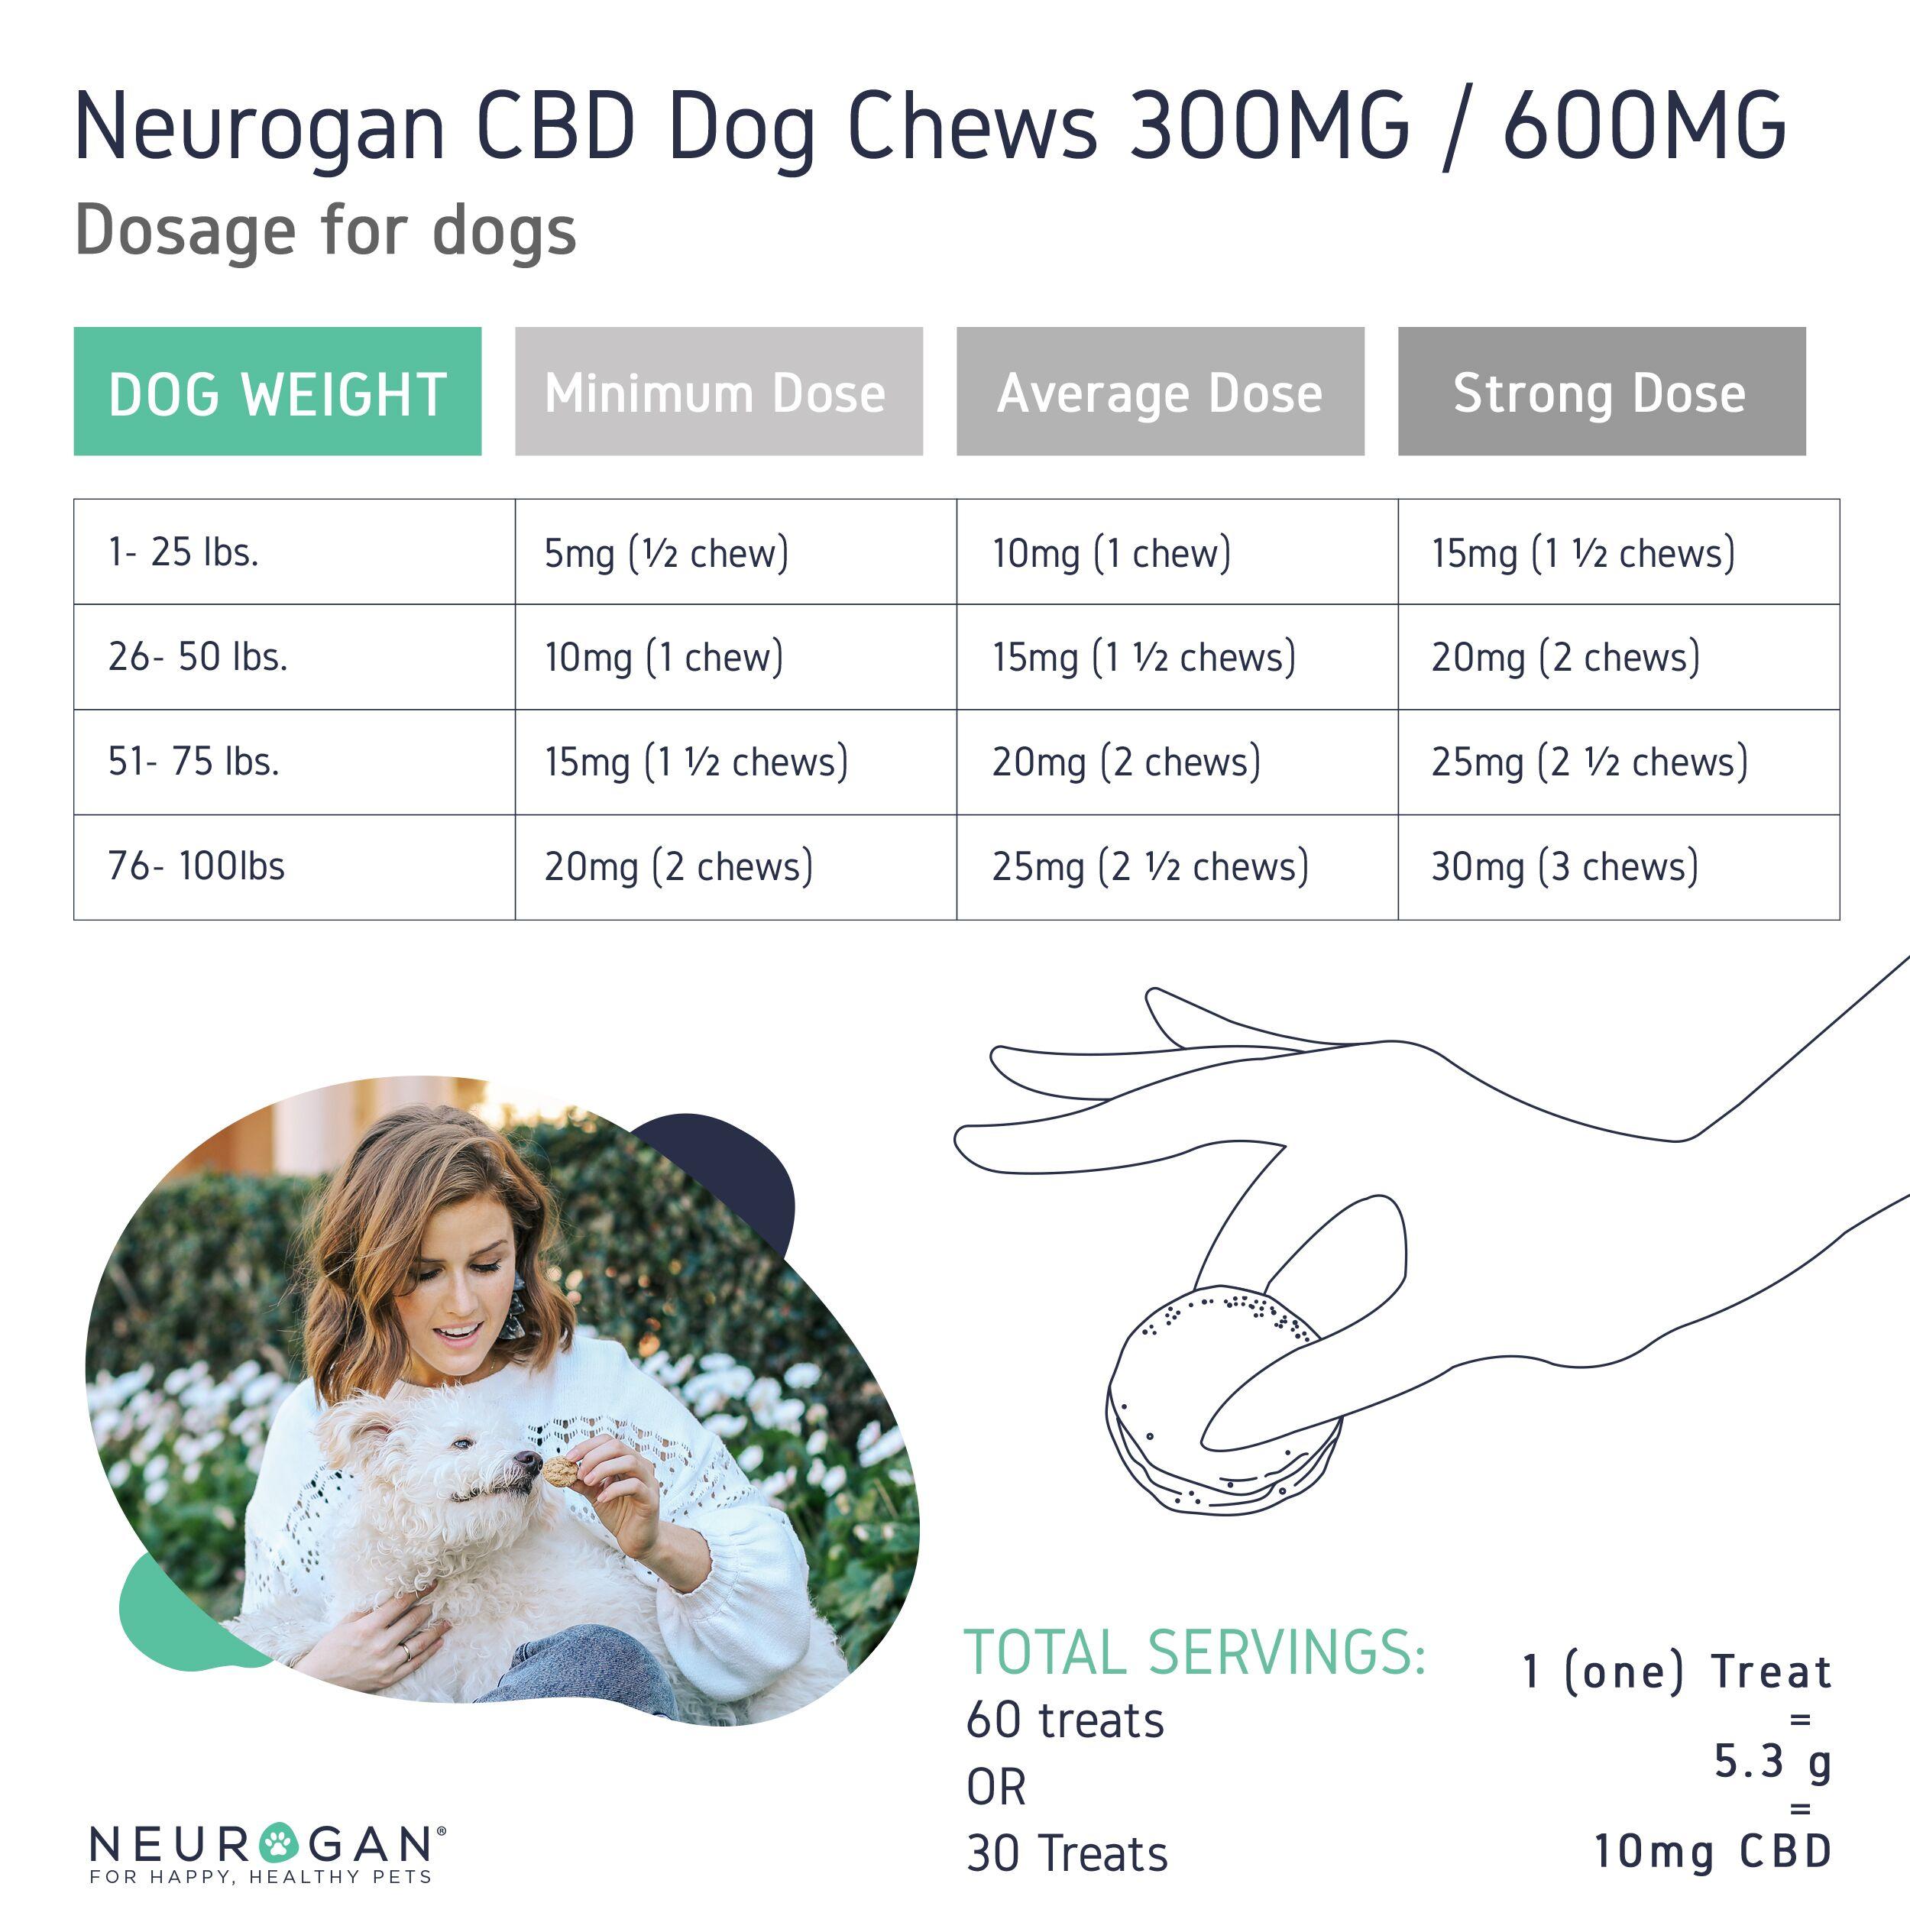 neurogan cbd pet treats dosage